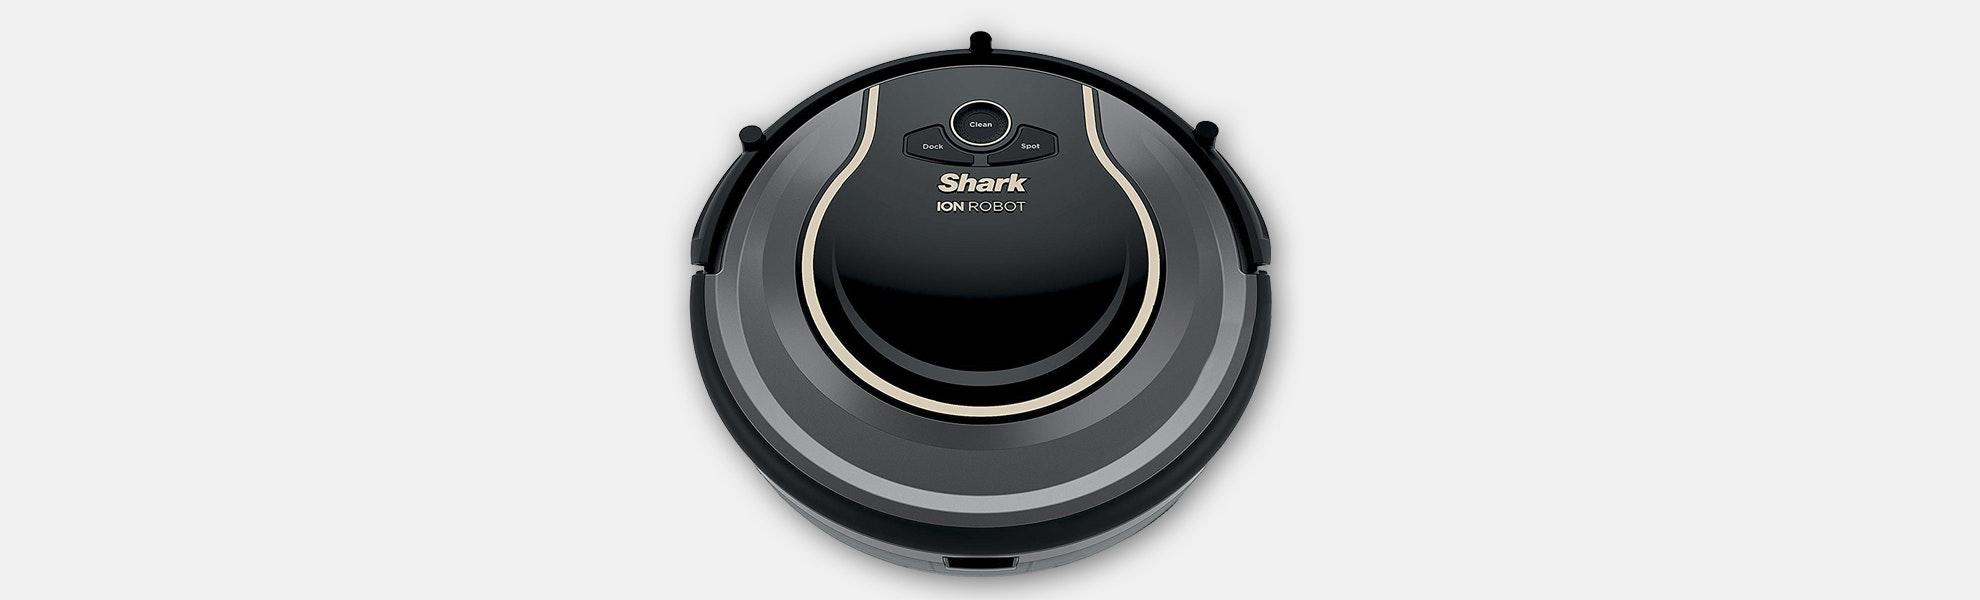 Shark ION Robot 750 Smart Vacuum